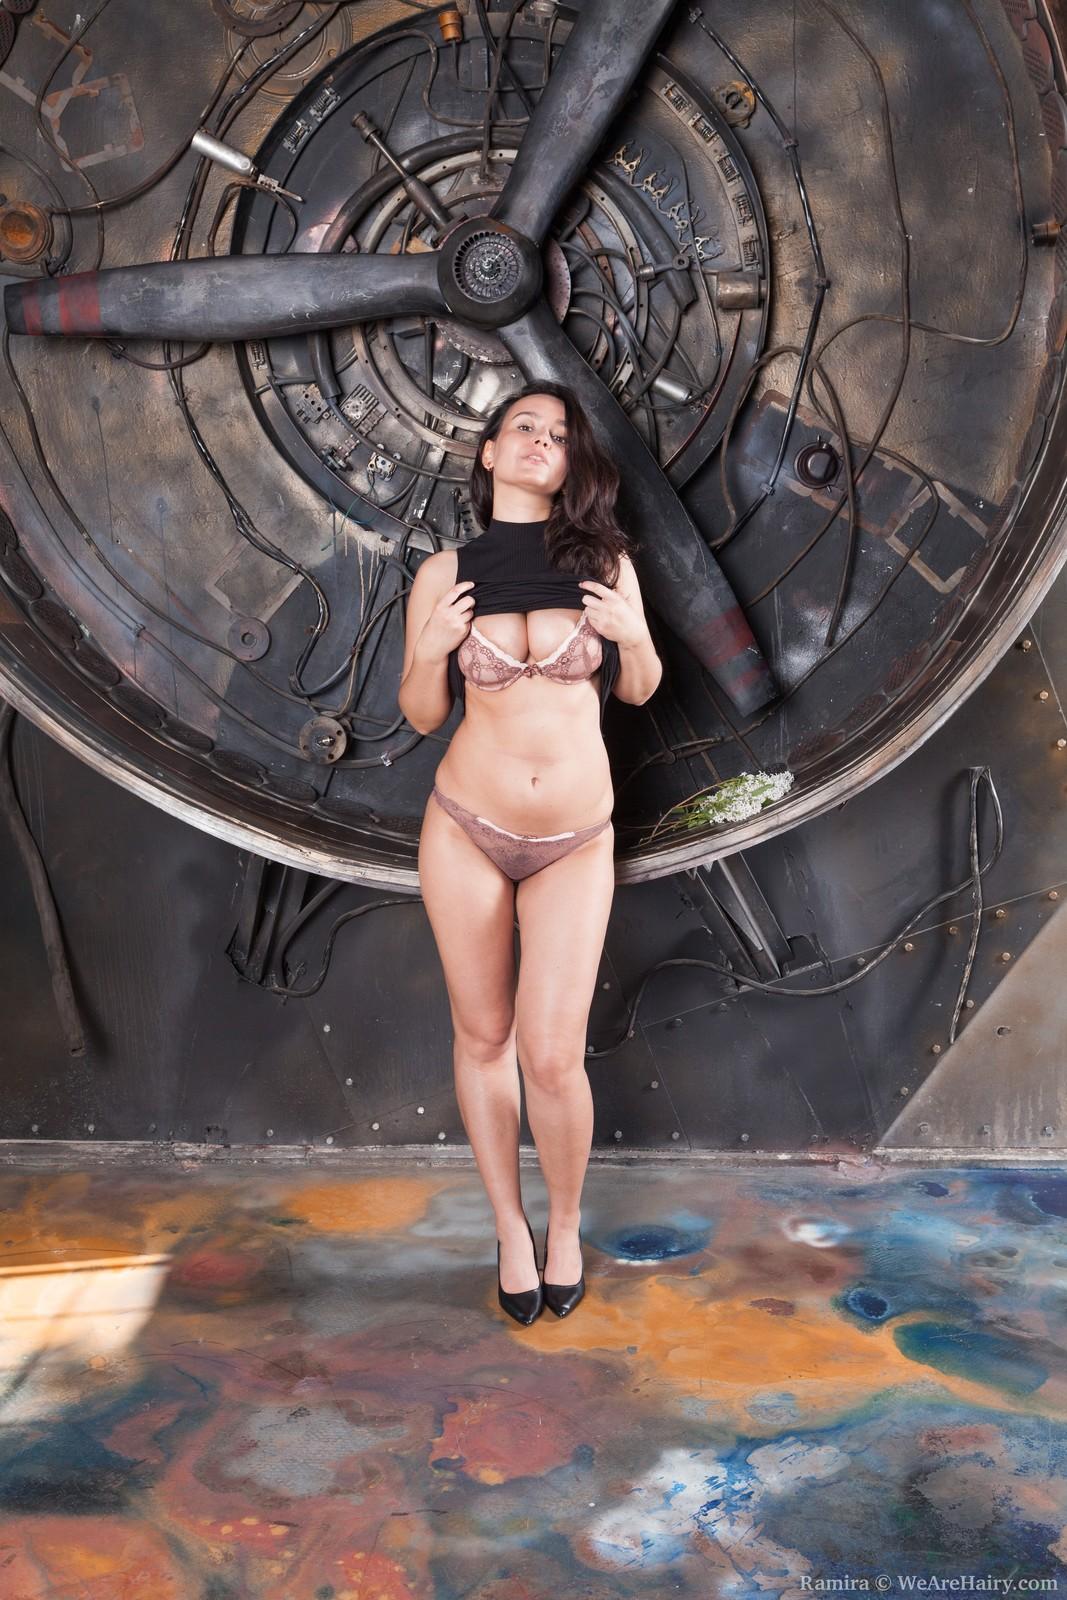 Busty curvy cutie Ramira is proud of her nude hairy figure